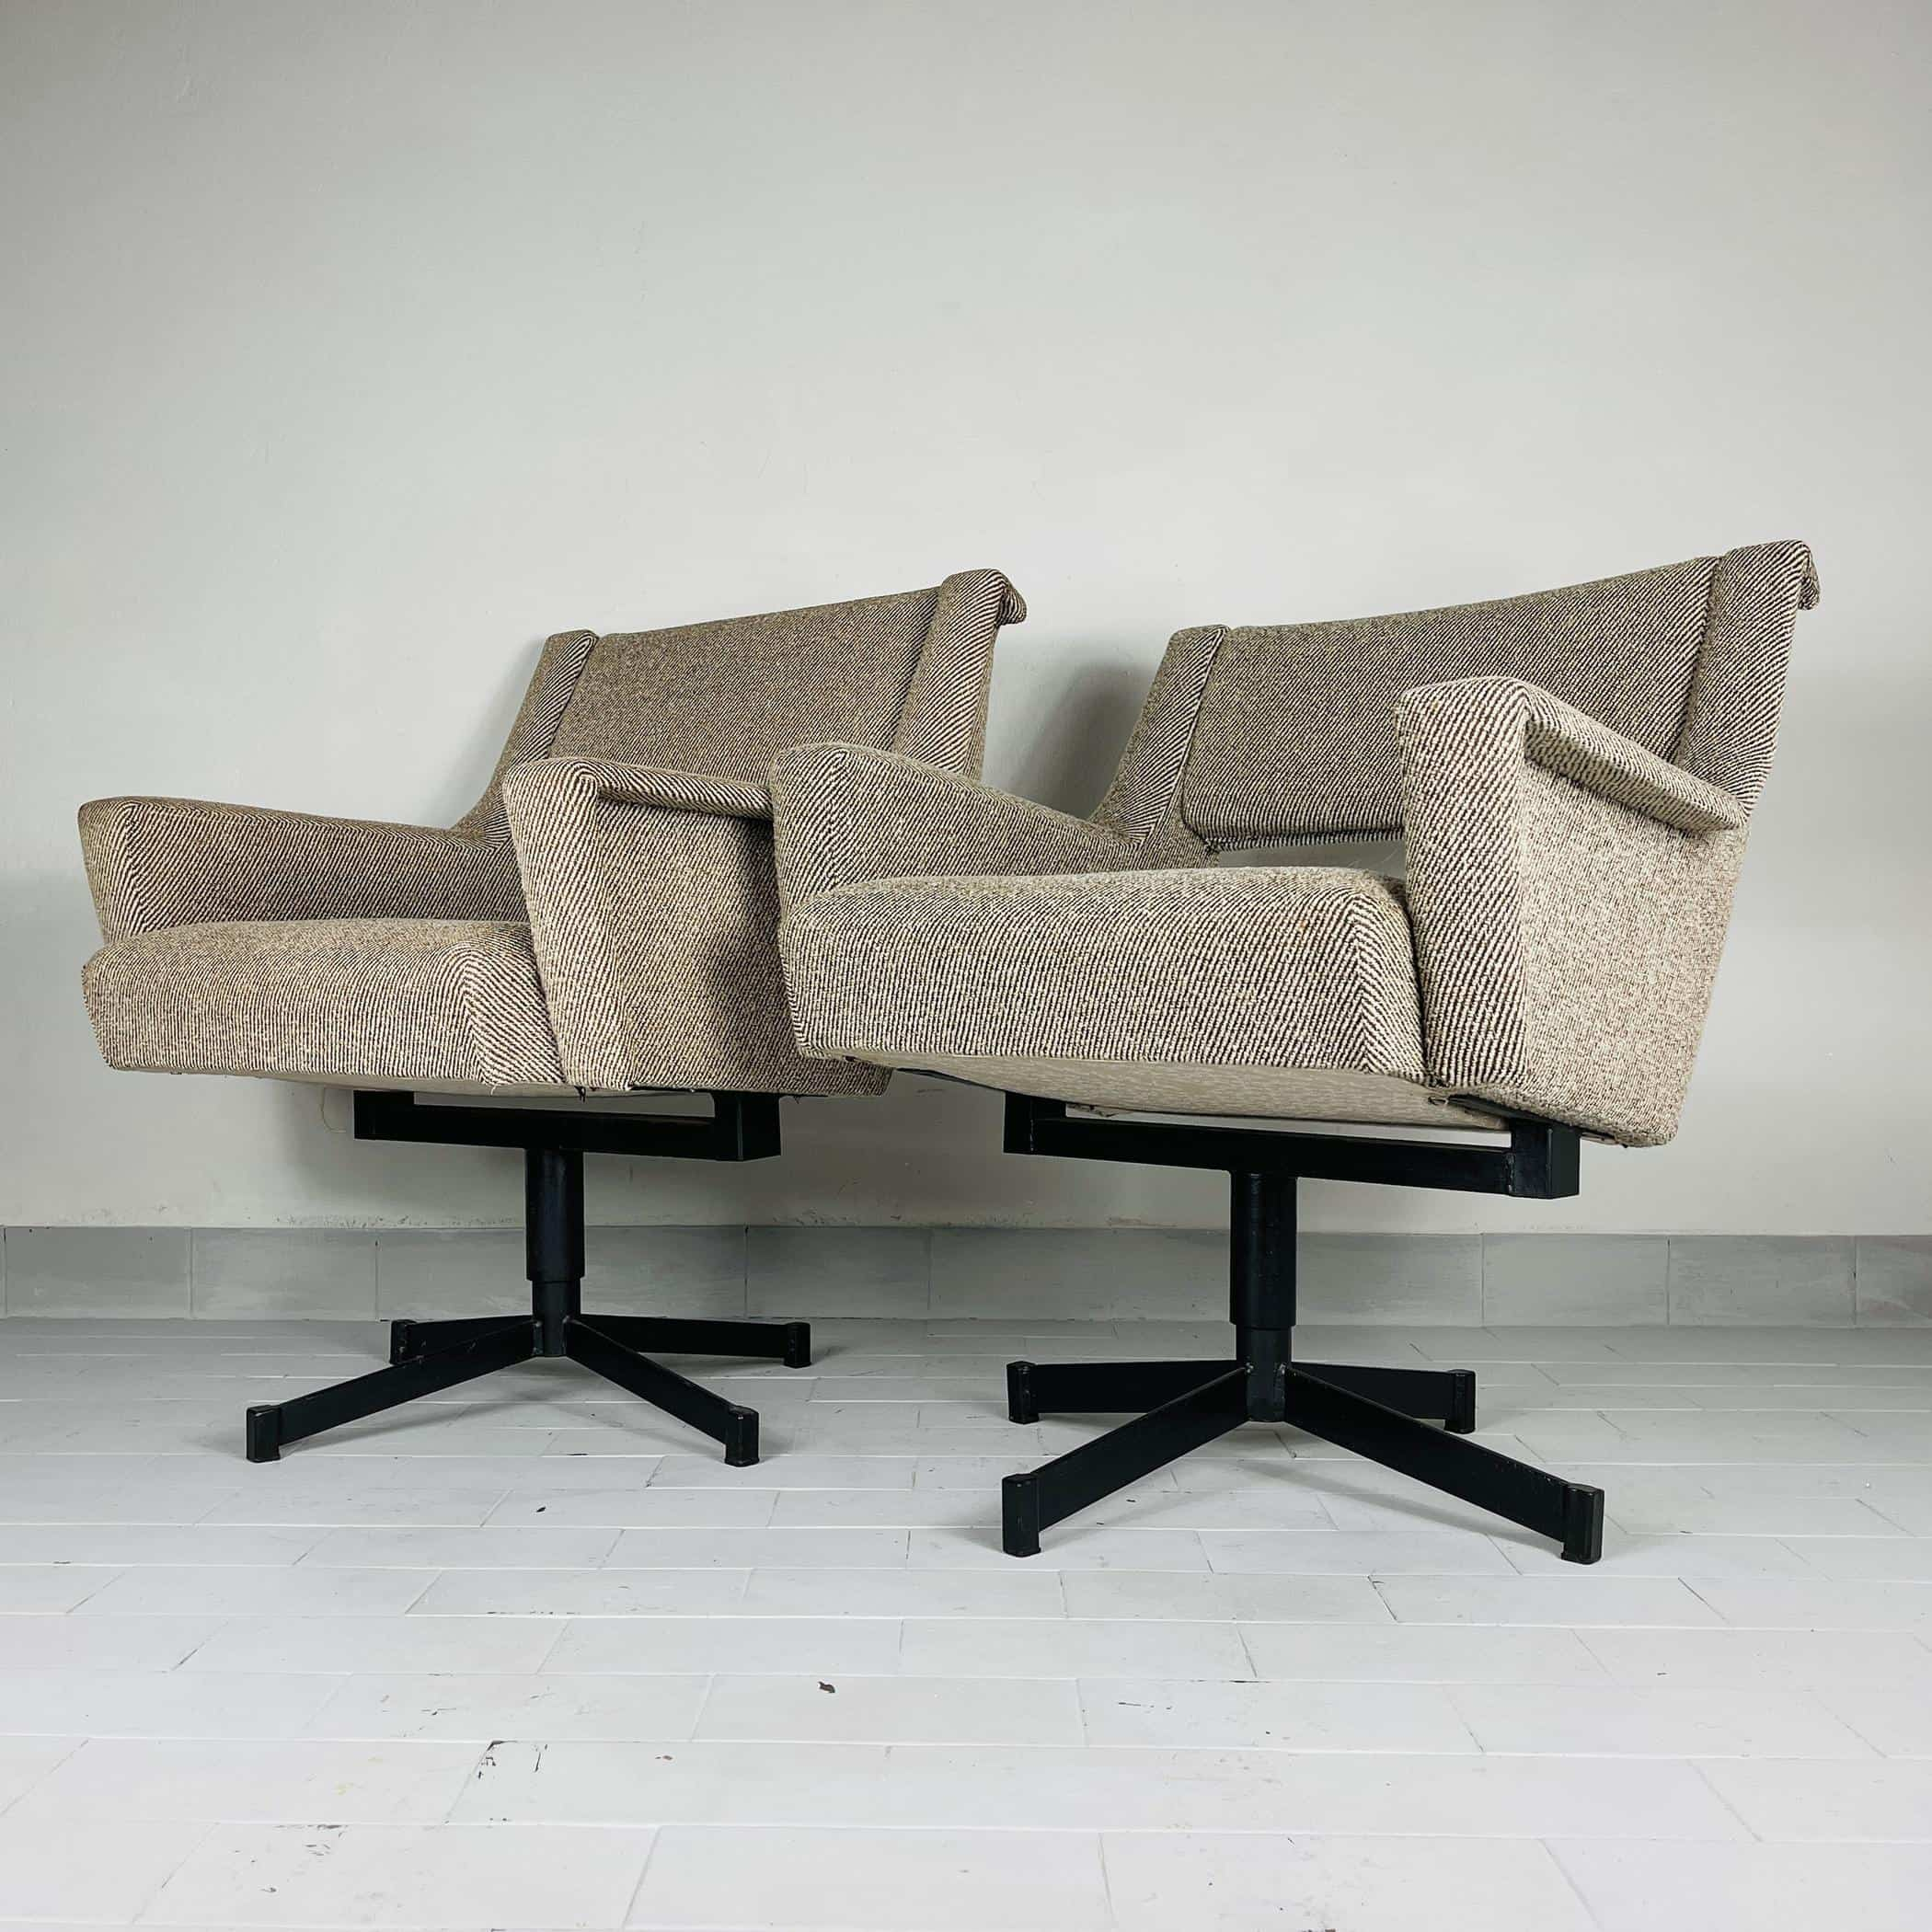 1 of 2 Mid-century lounge chair Yugoslavia 1960s